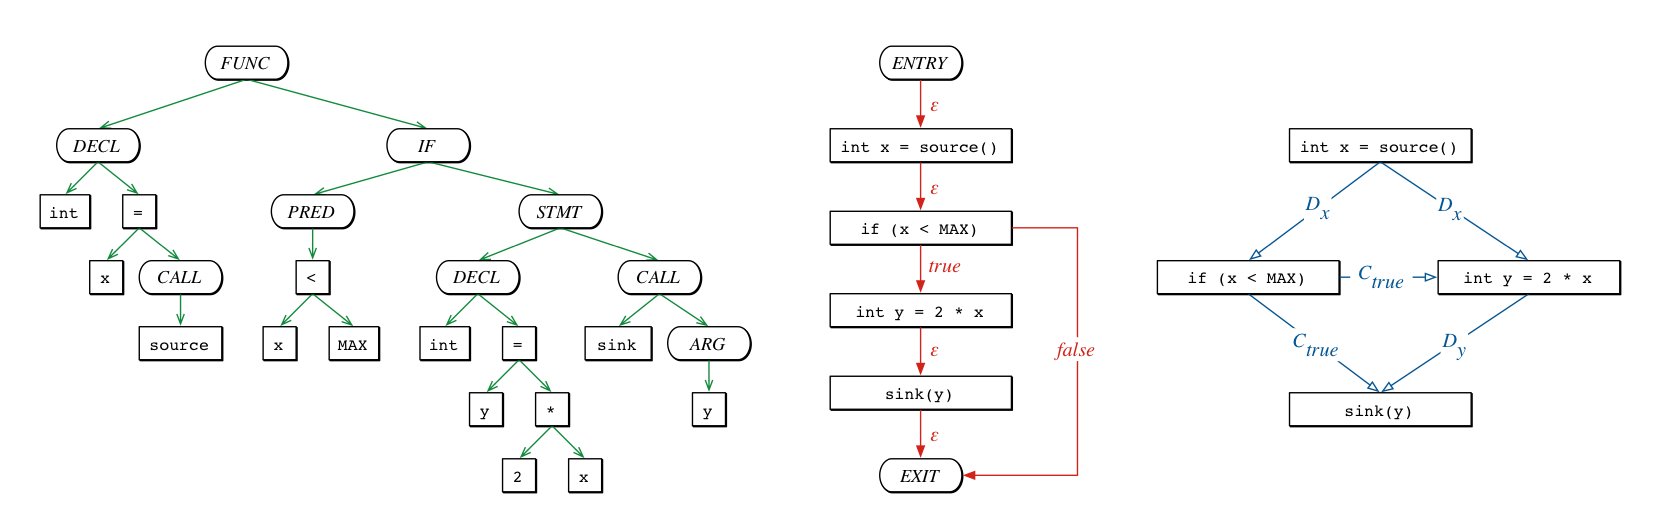 Different program representations